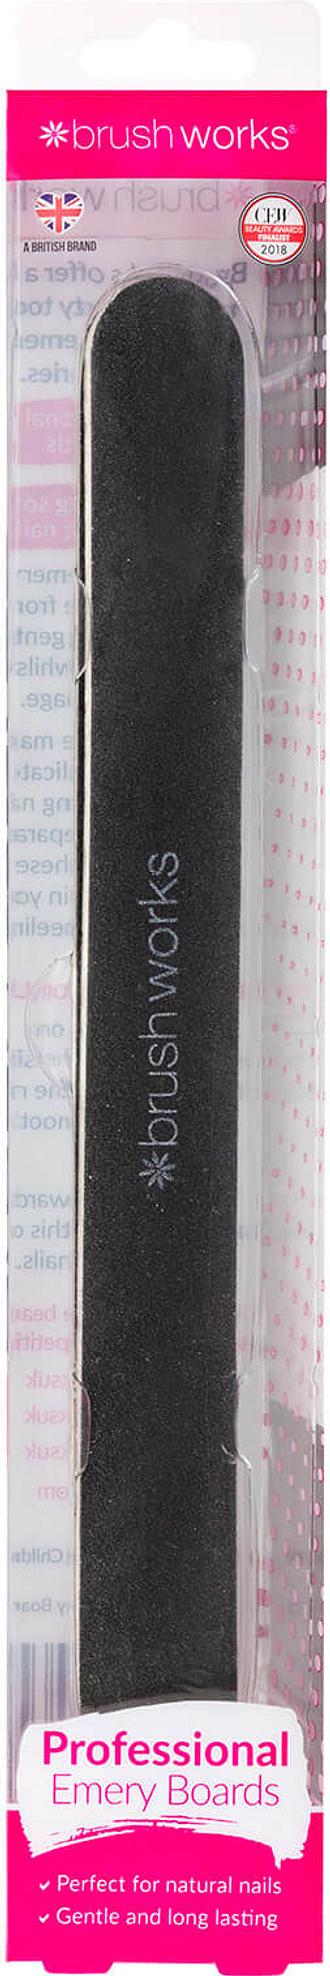 brushworks Professional Emery Boards (Set of 2)